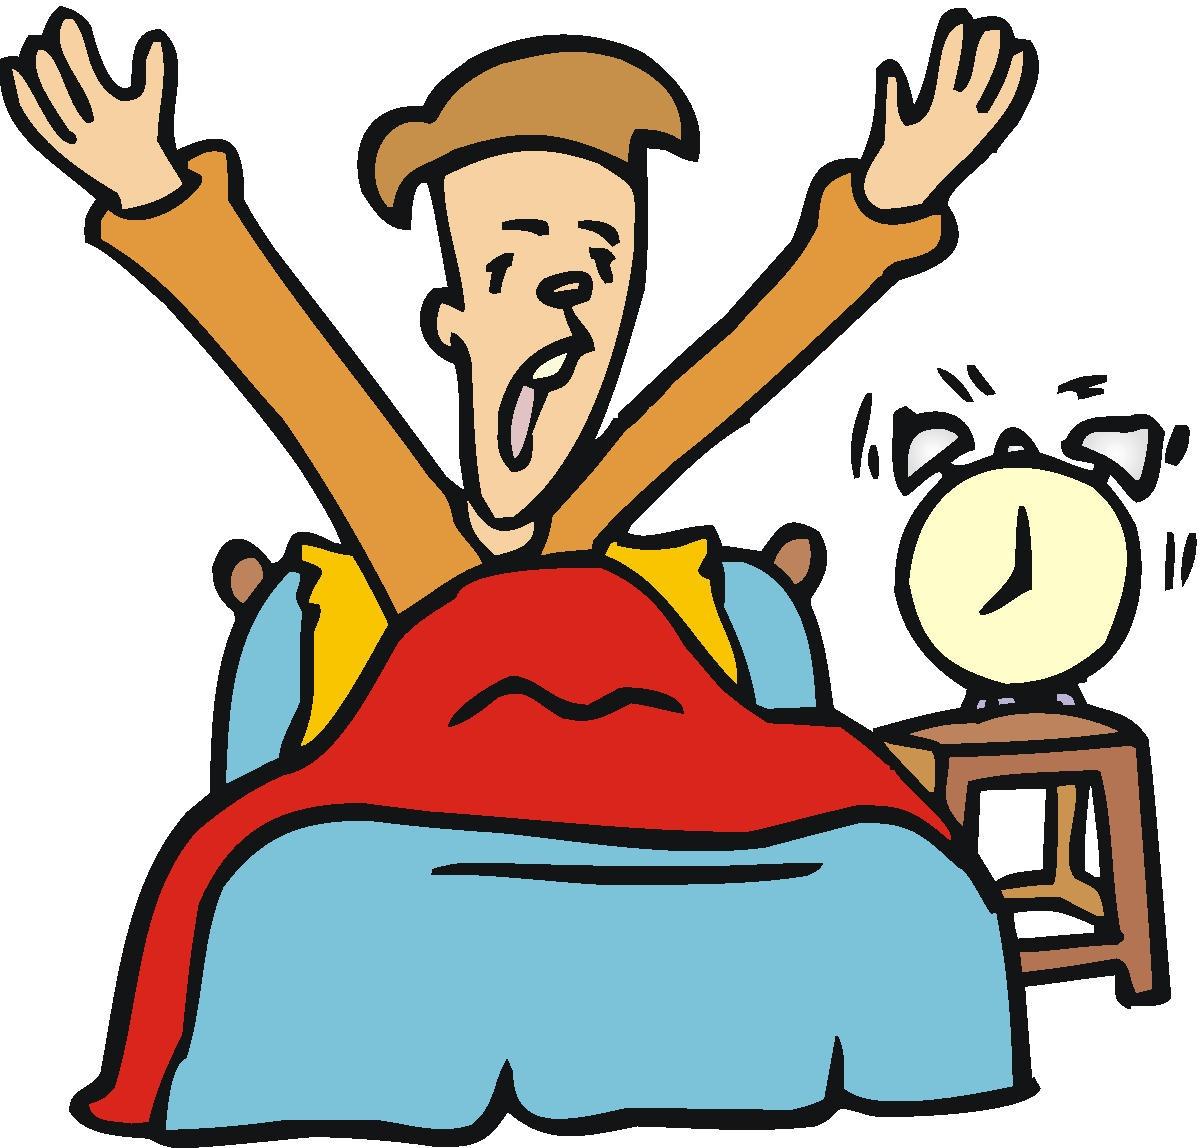 Are You Awake Clipart.